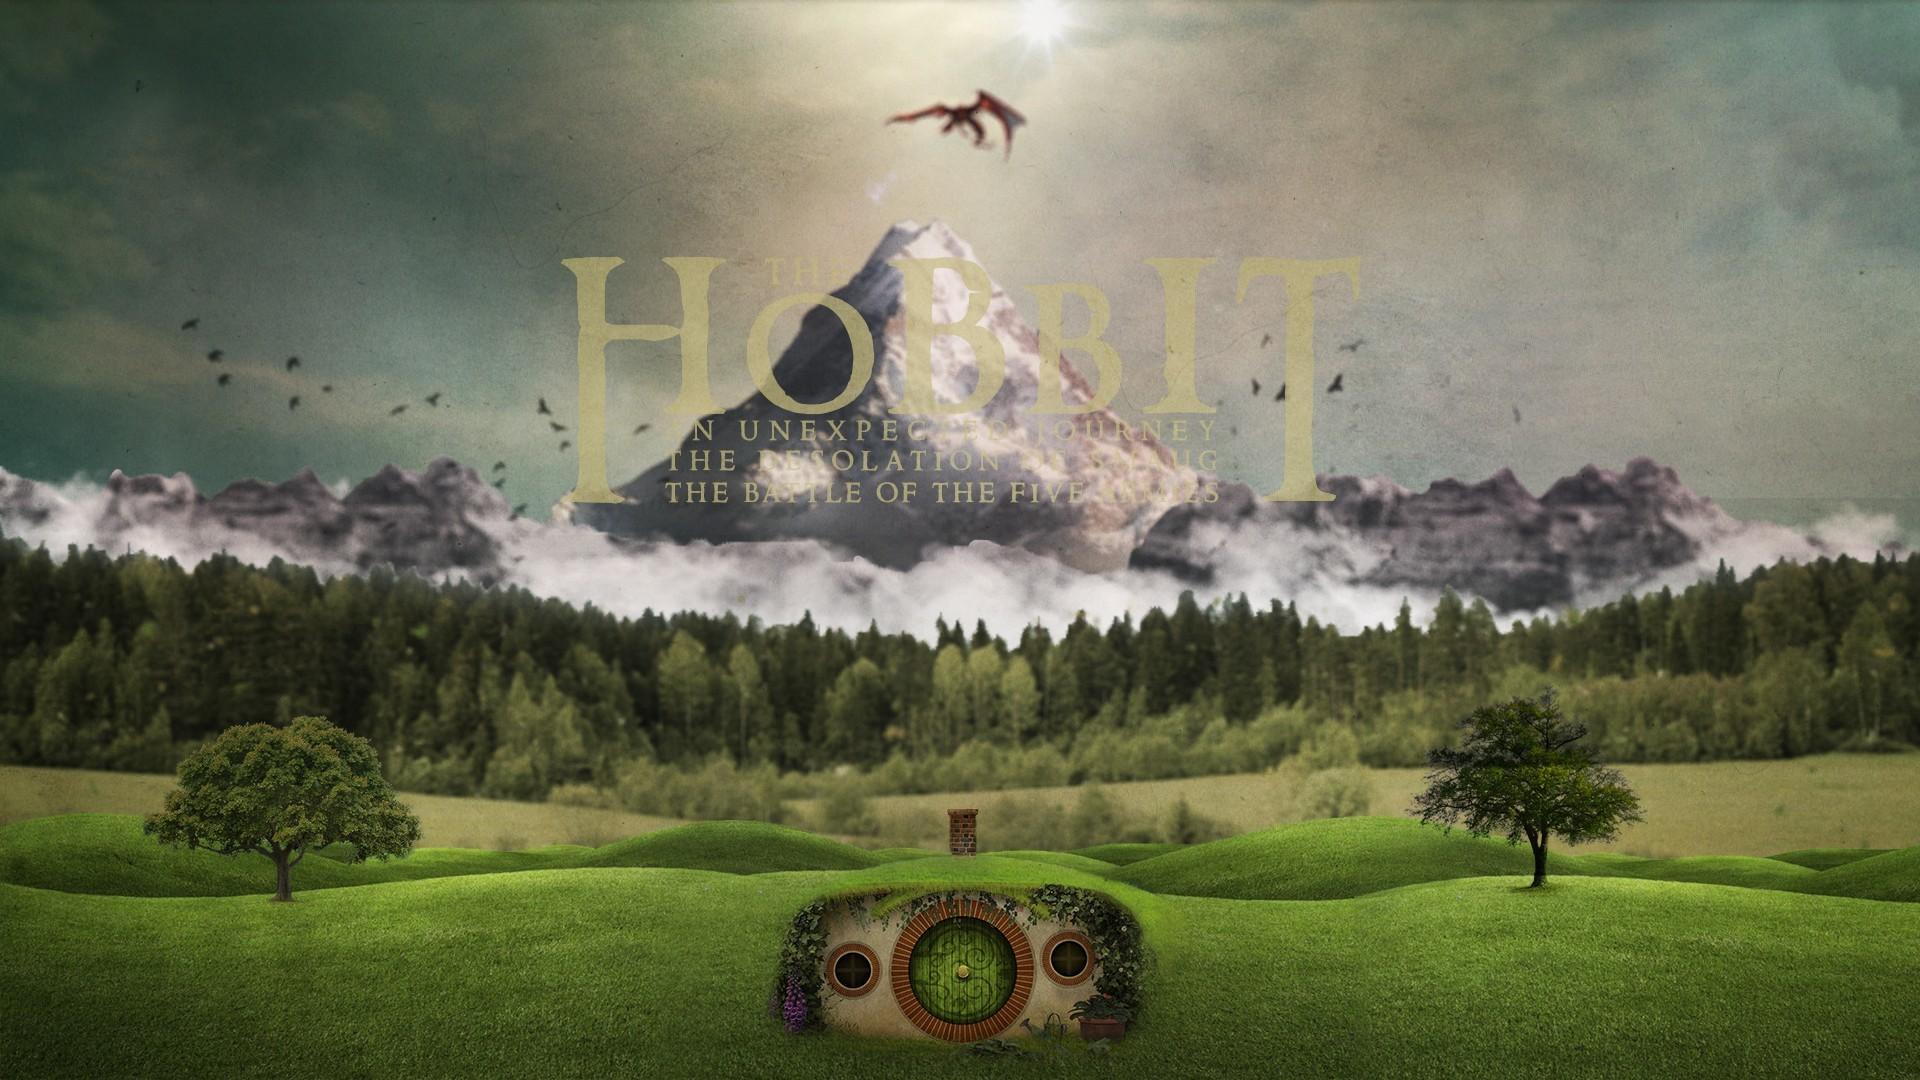 General The Hobbit The Hobbit: The Battle of the Five Armies The  Hobbit: